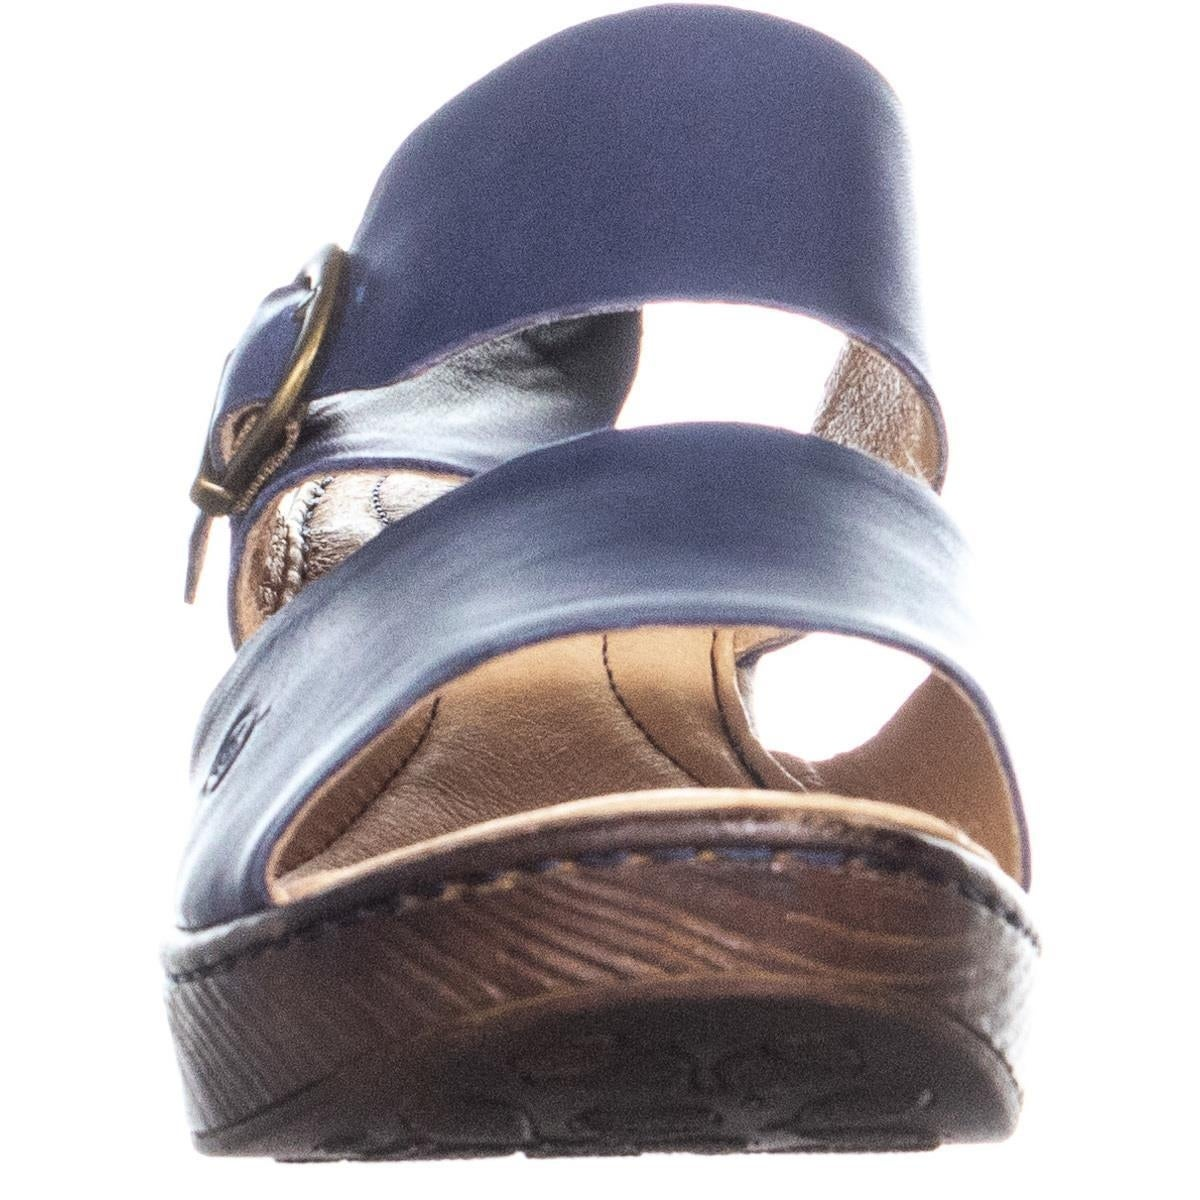 8cf3b6e6c320 Shop Born Carrabelle Buckle Slip On Platform Sandals